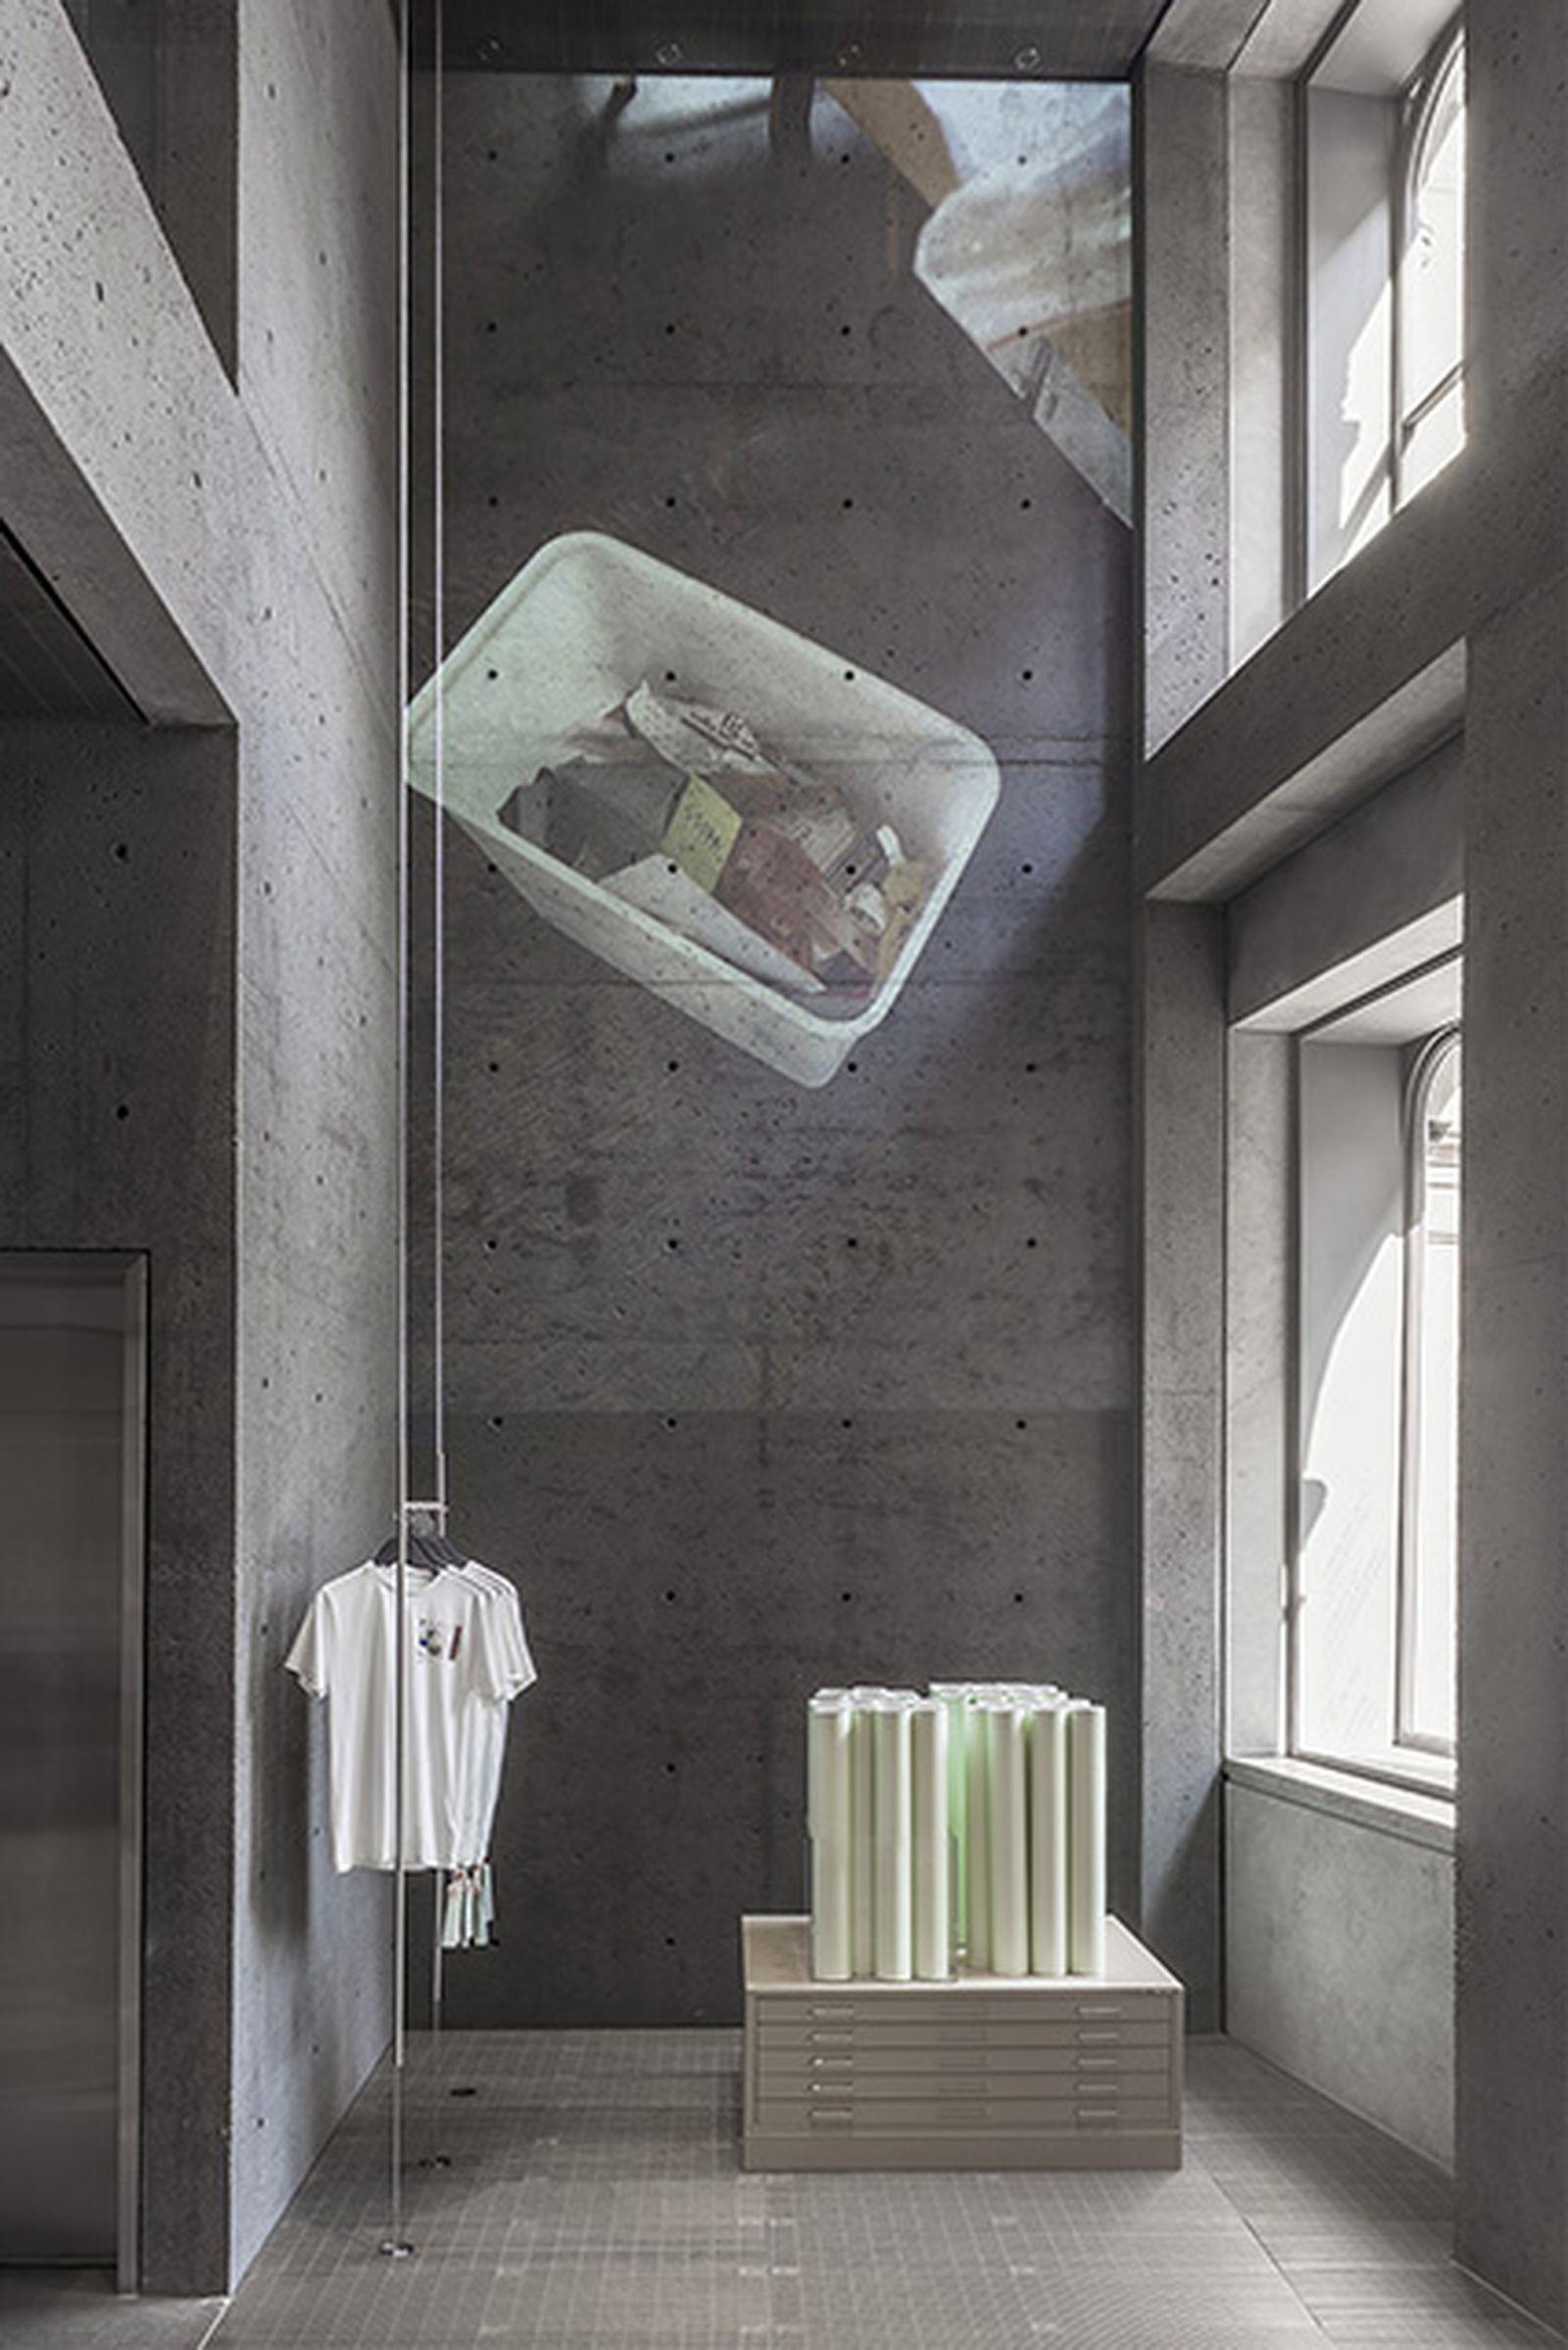 virgil abloh cutting room floor exhibition ssense